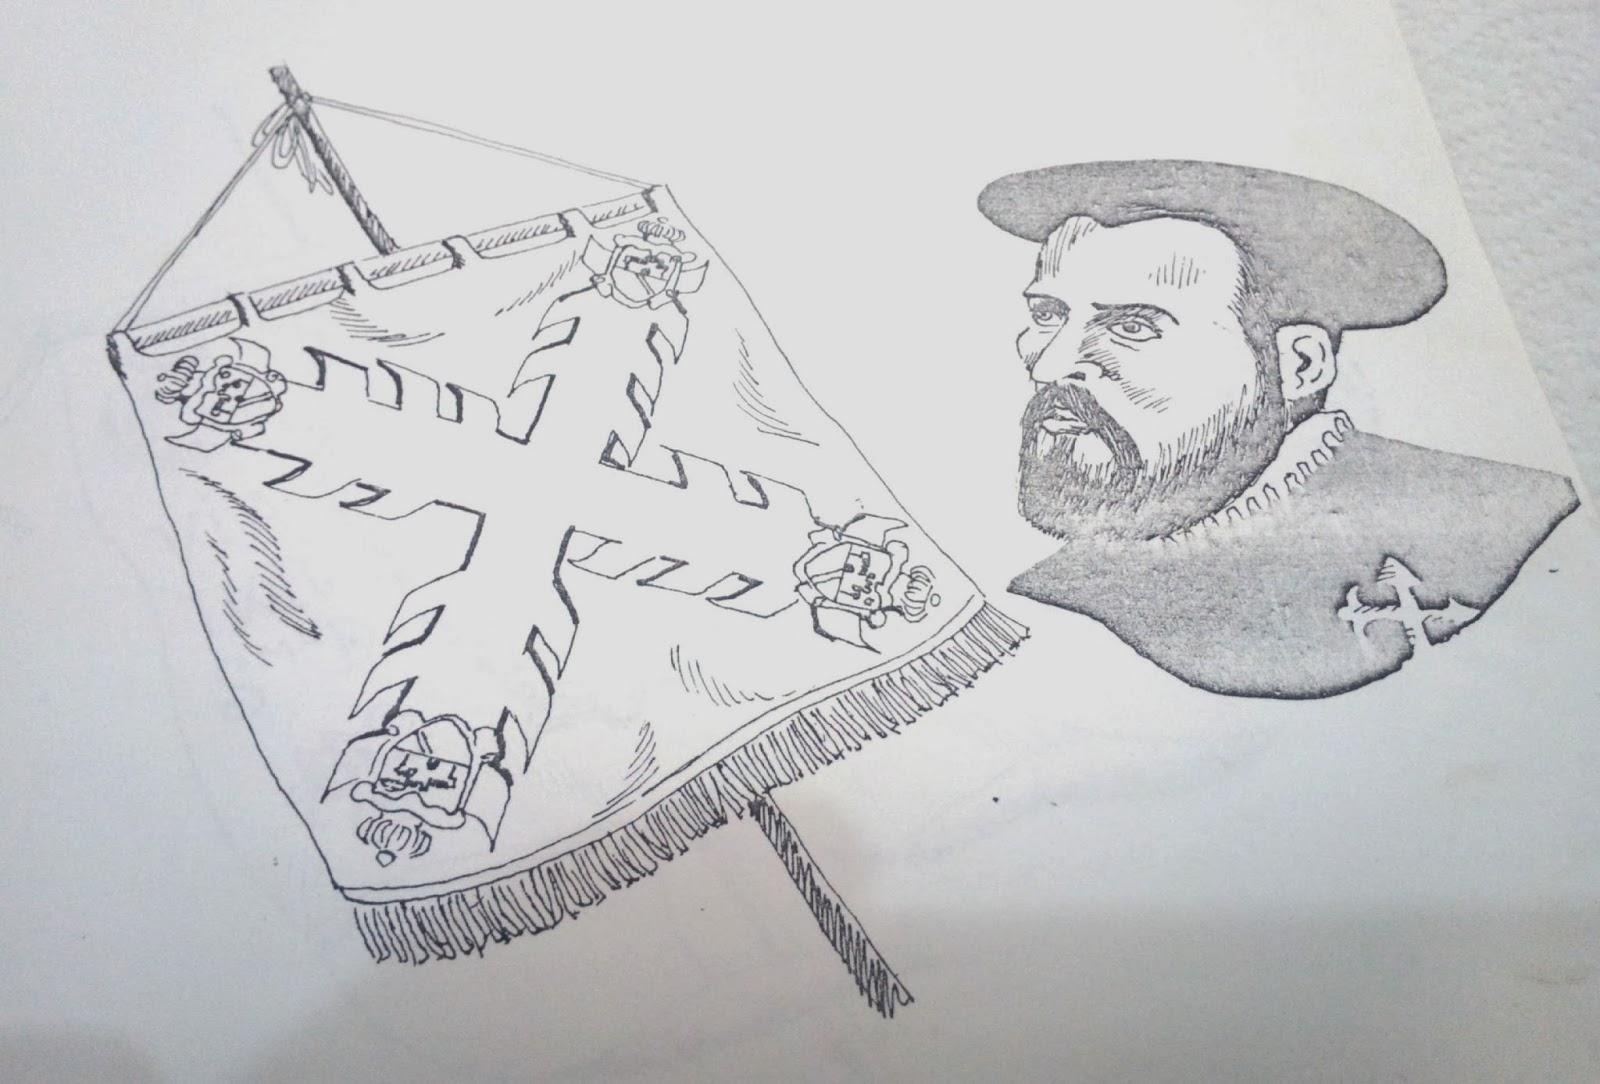 Estandarte de la Nueva España: